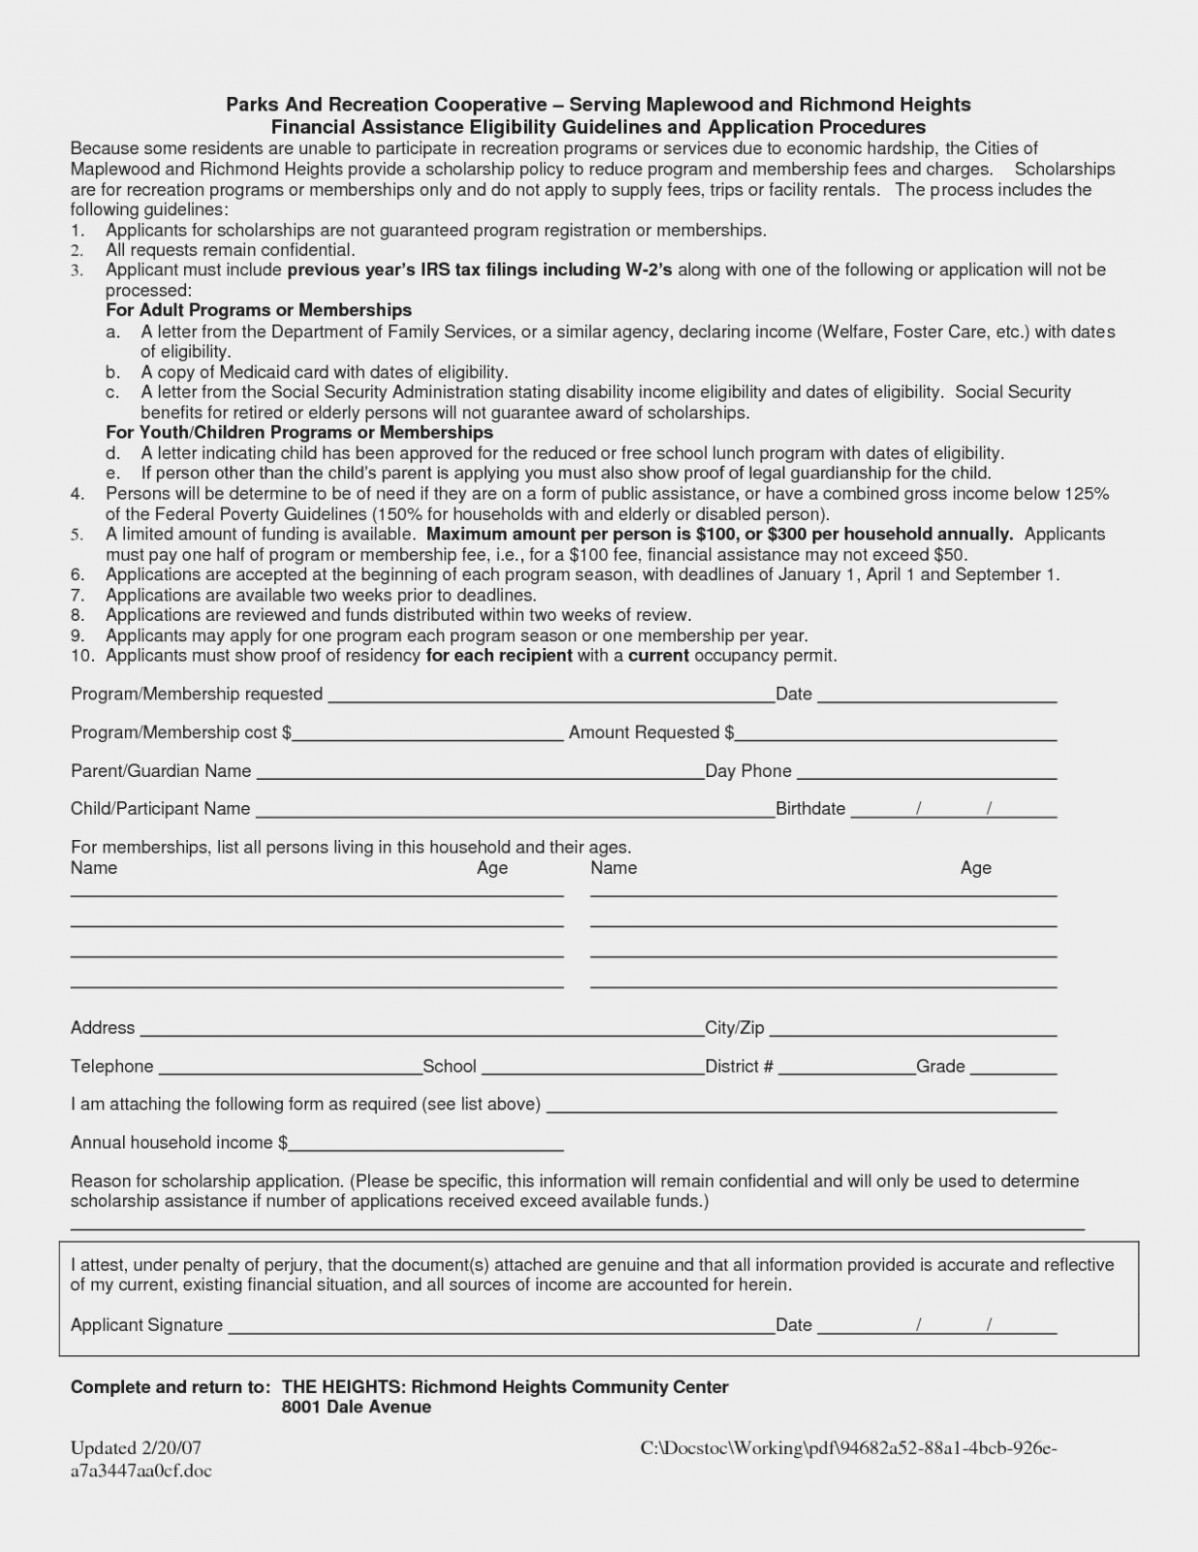 Free Printable Legal Guardianship Forms | Aboutplanning .. – The - Free Printable Legal Guardianship Forms